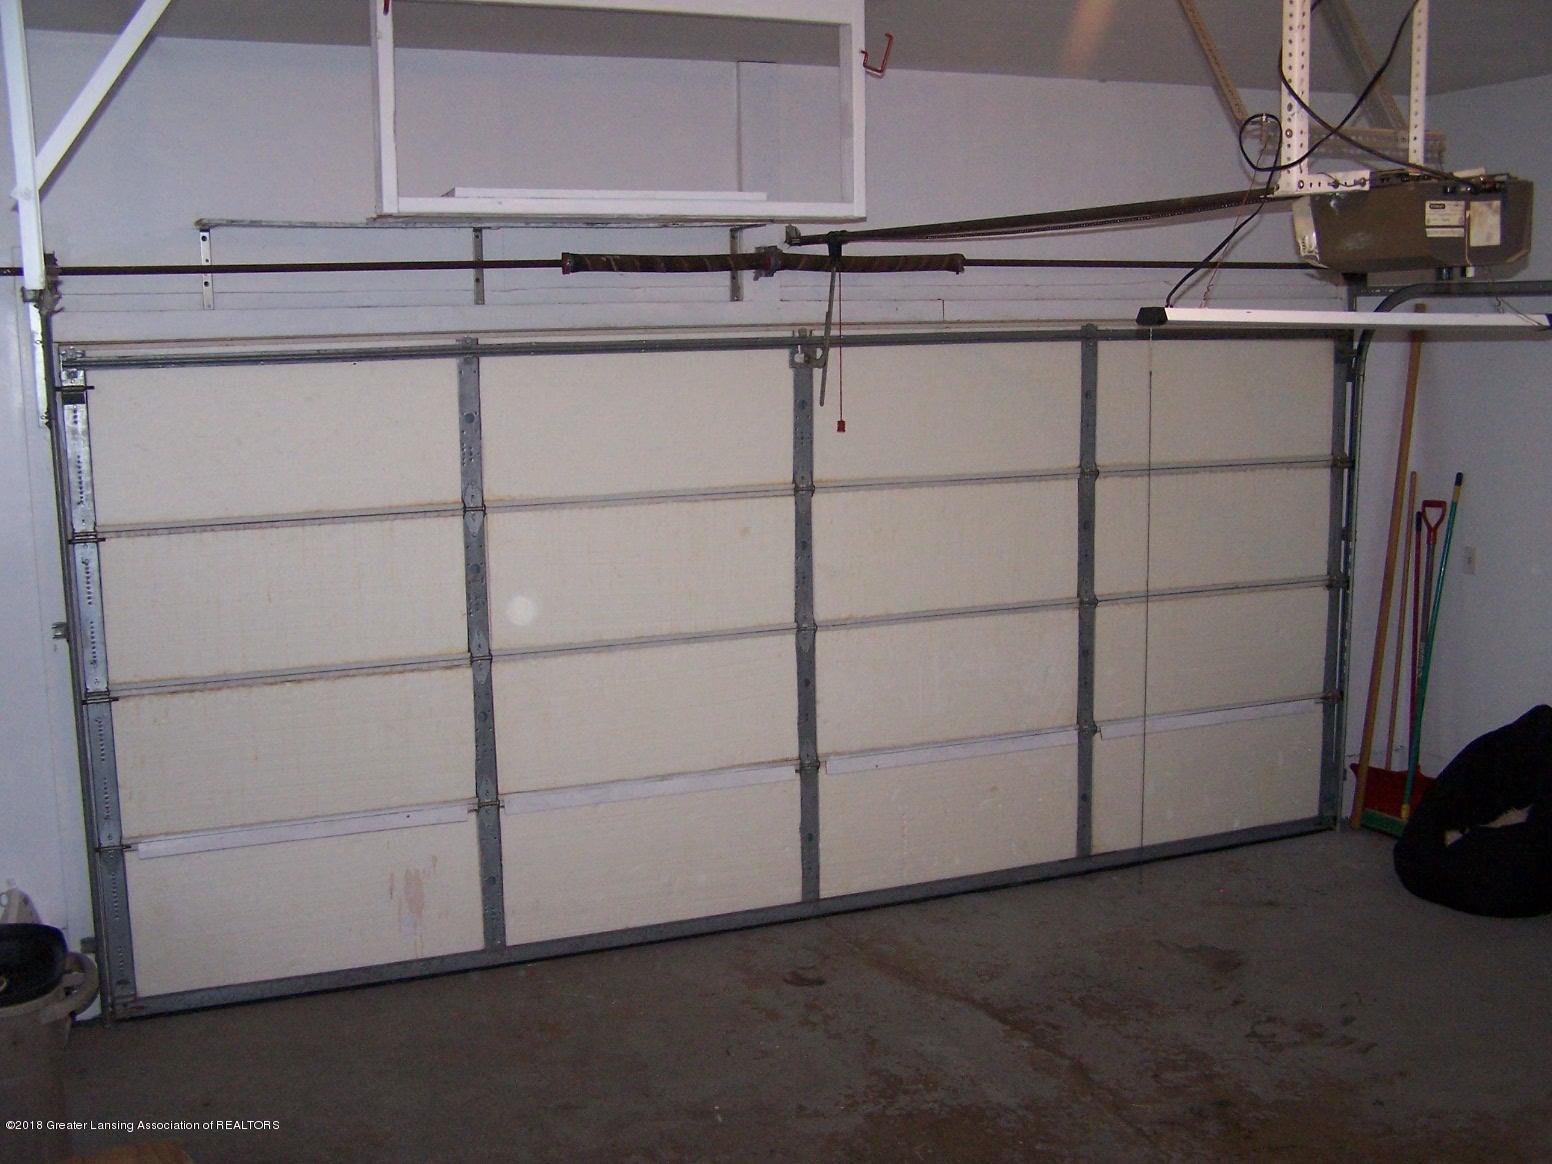 805 Raeburn Rd - Garage - 38